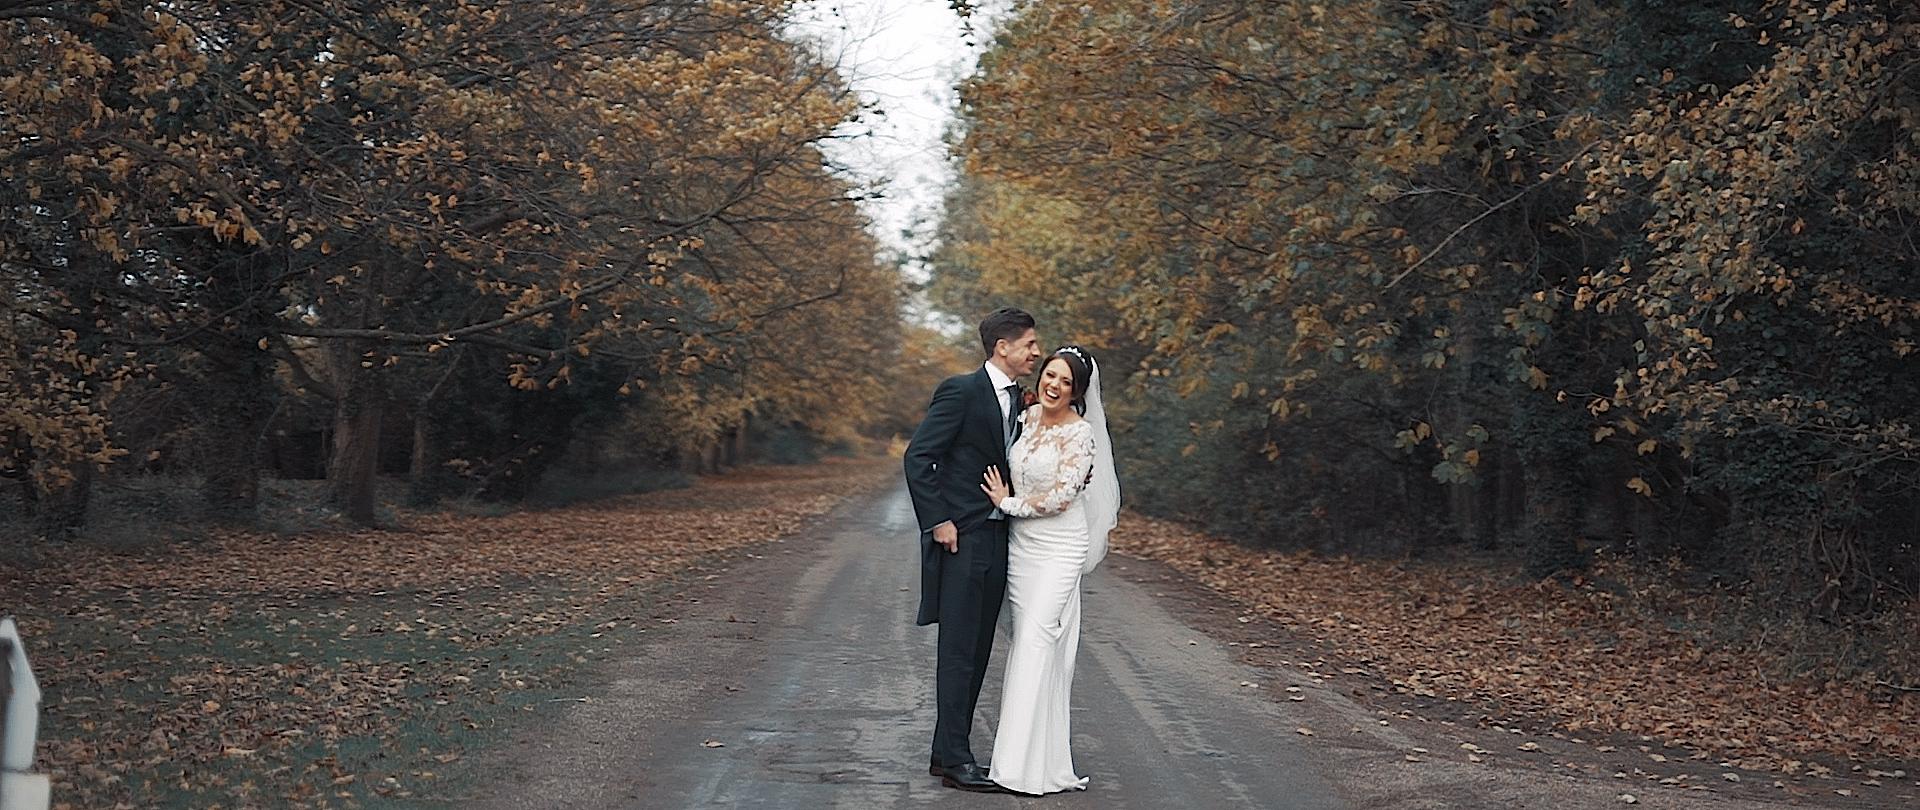 Newland Hall Wedding Video - Philip Smith Visuals